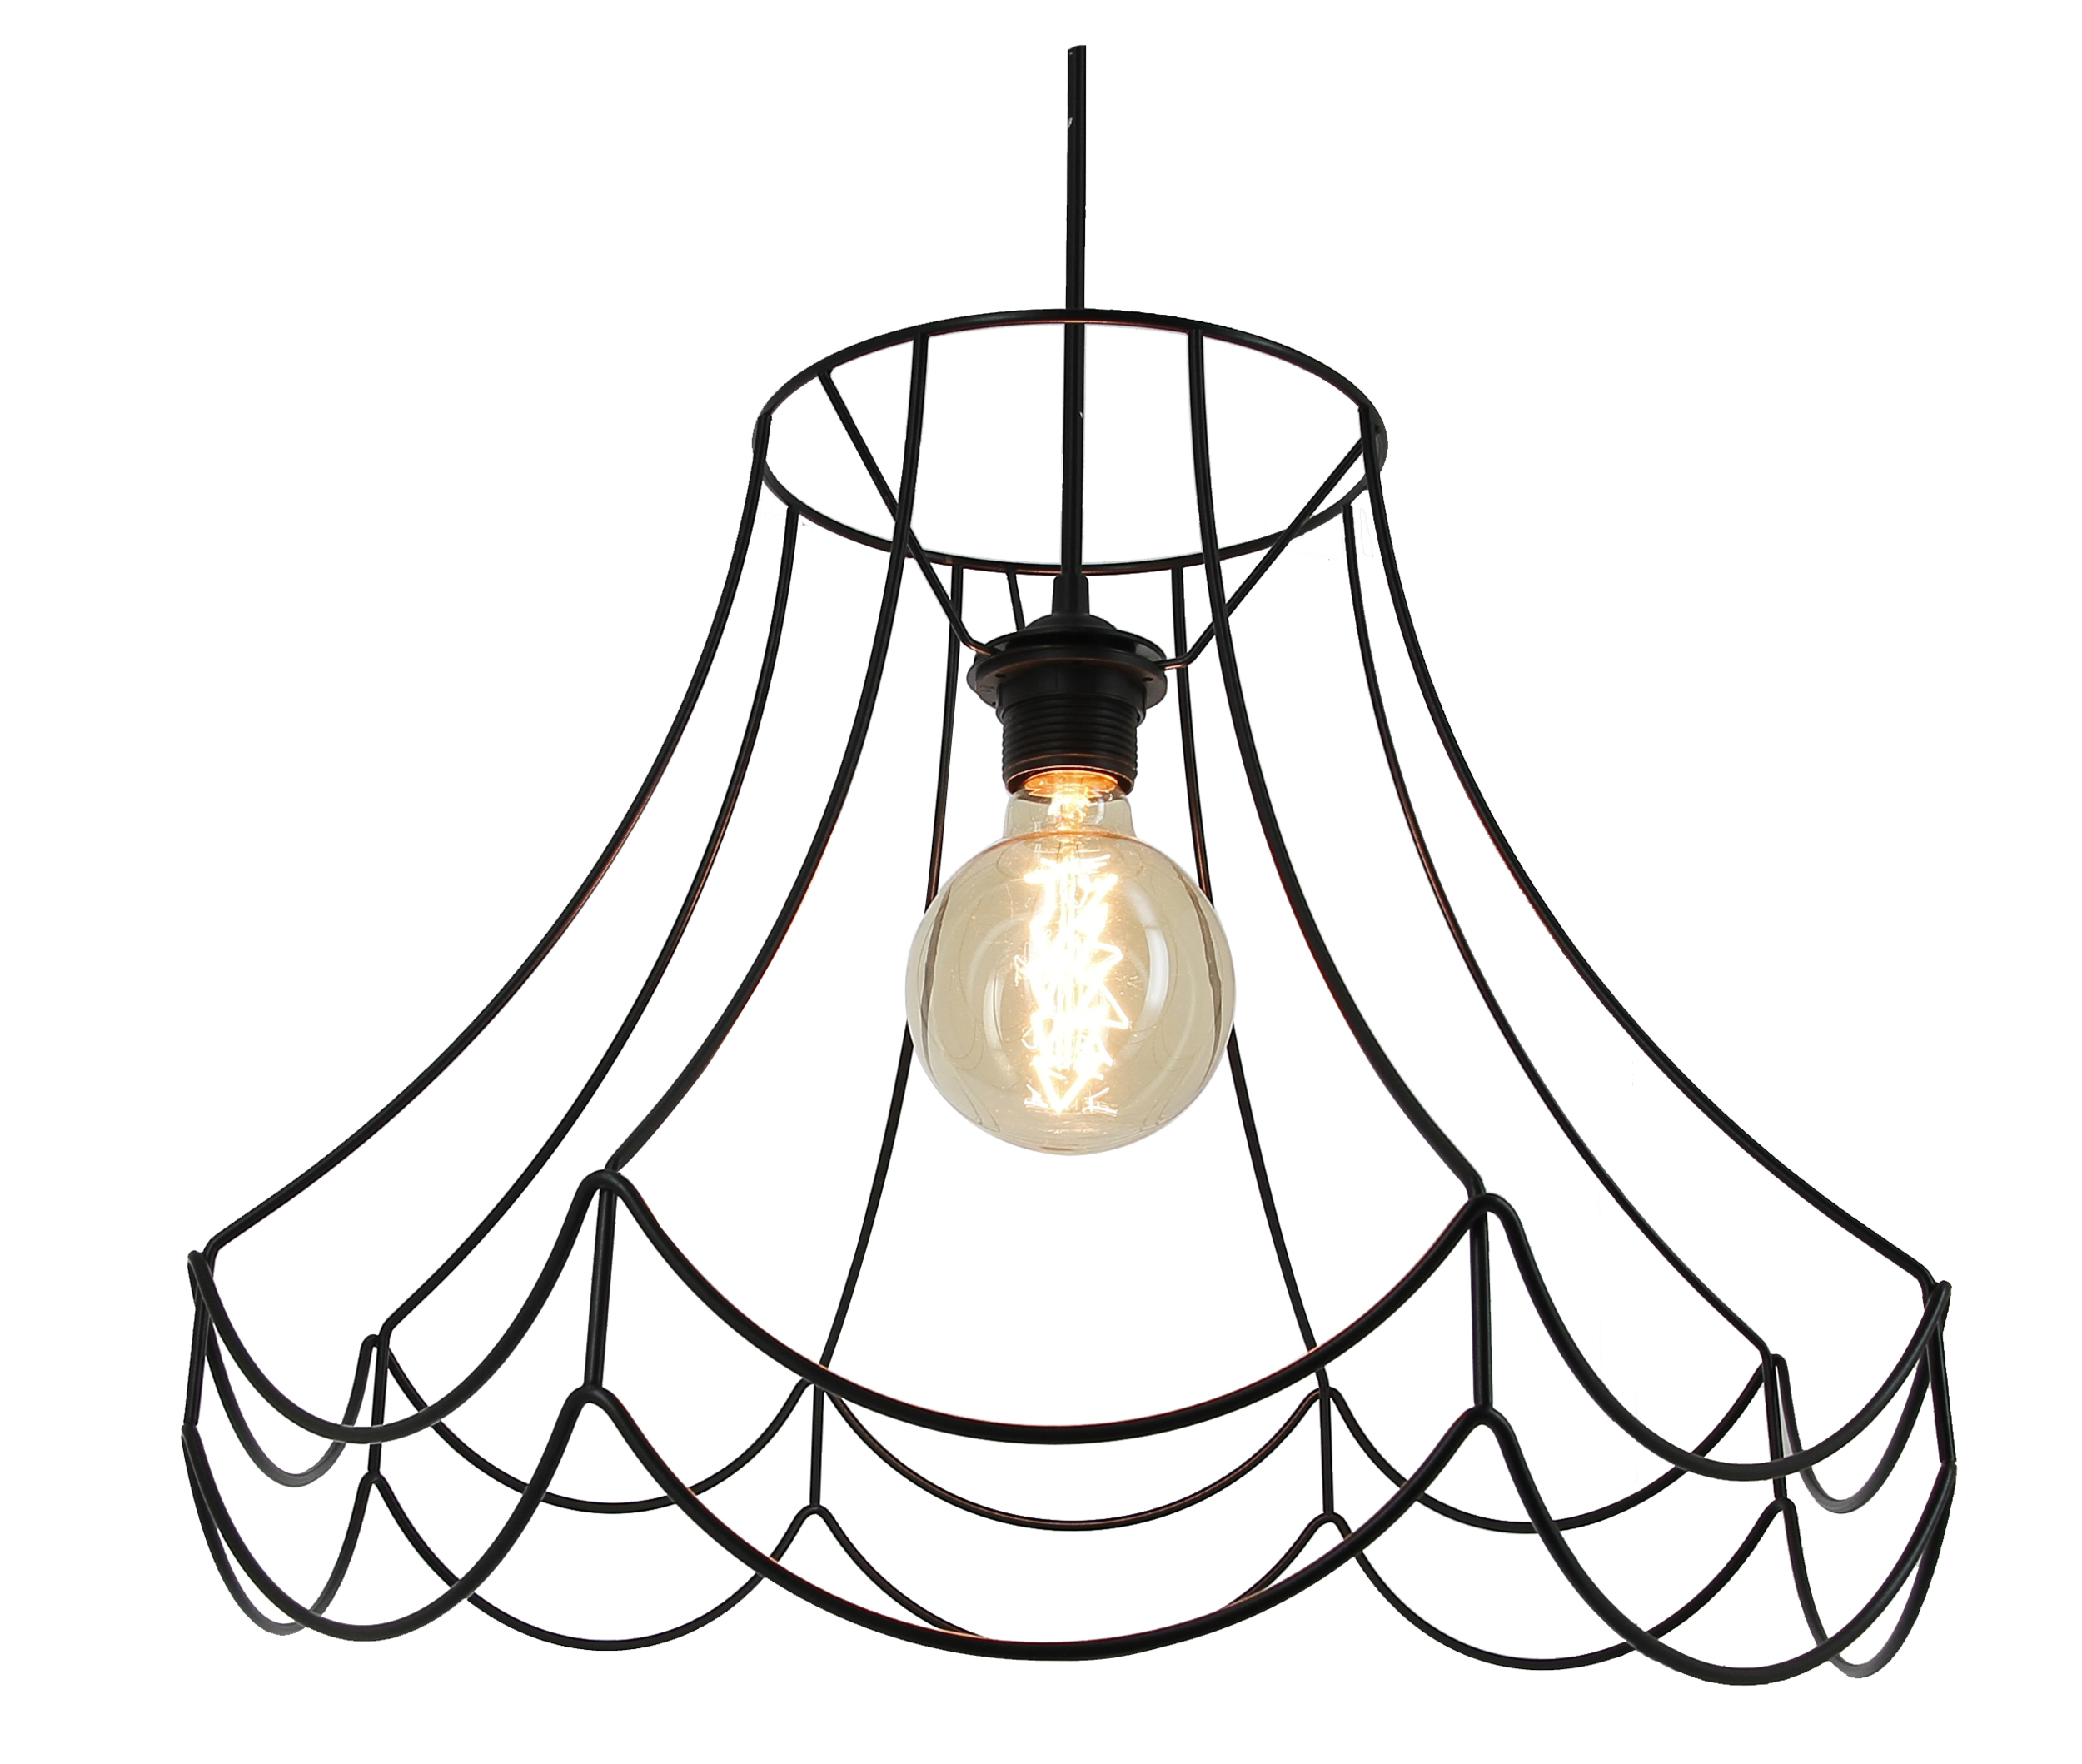 suspension filaire noire elegant suspension design. Black Bedroom Furniture Sets. Home Design Ideas